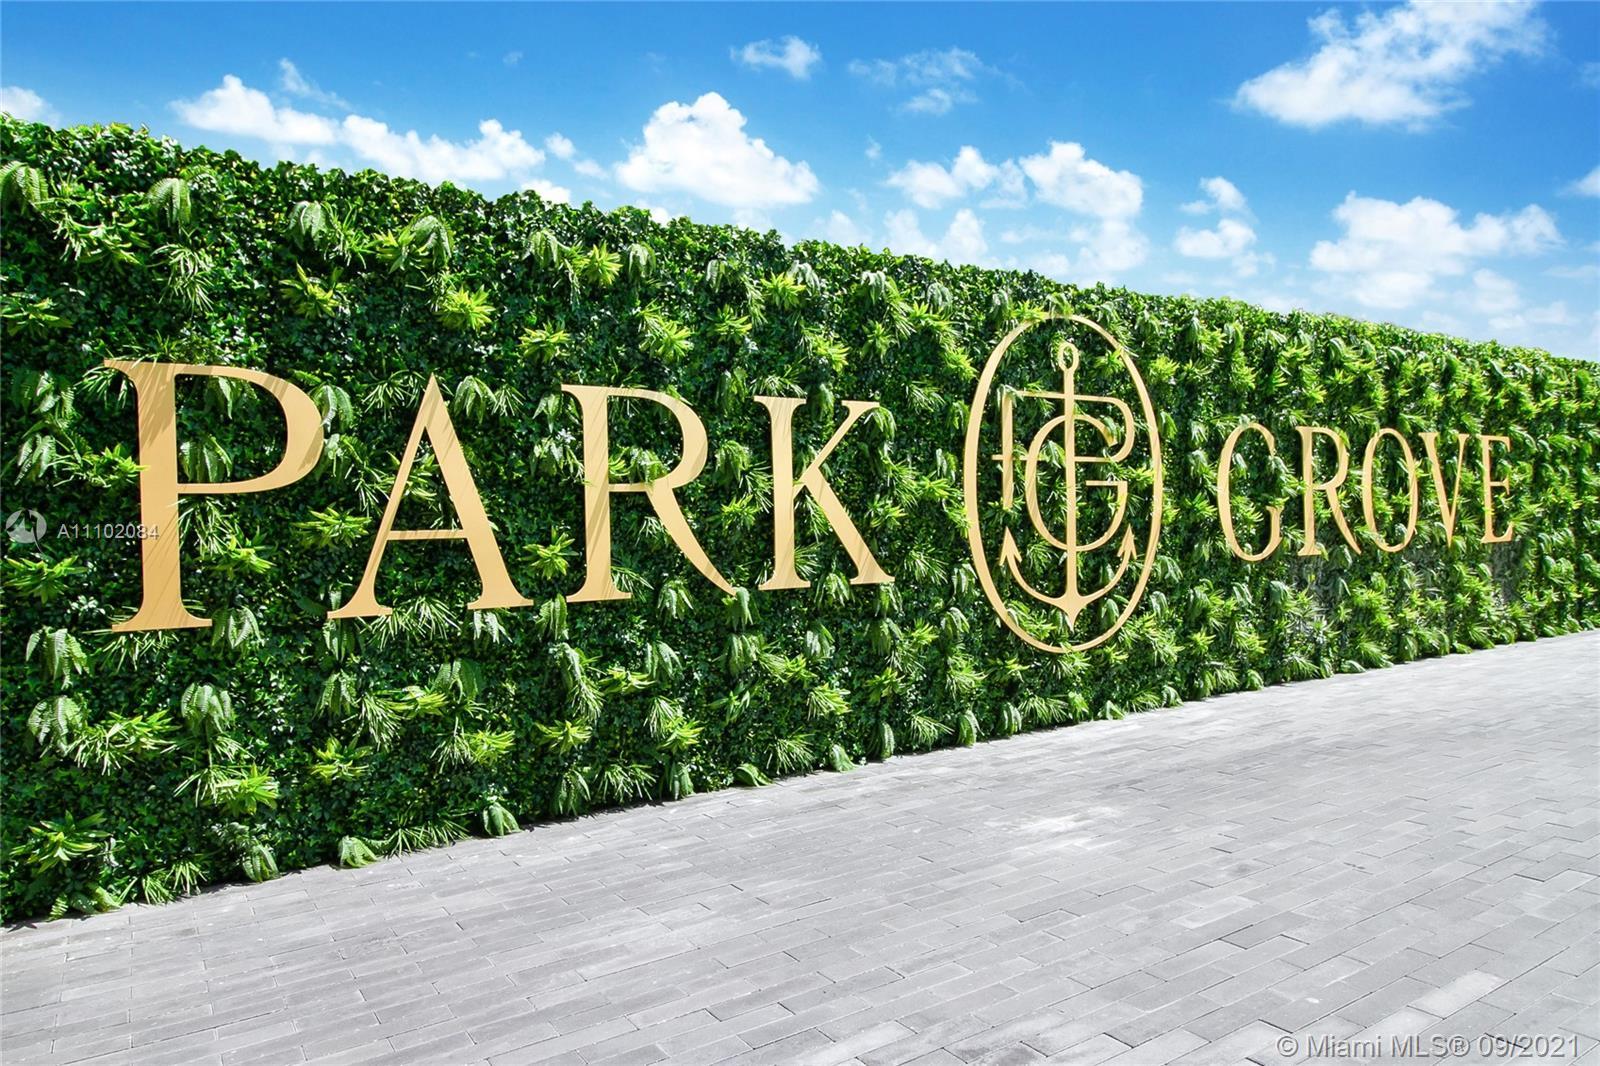 Park Grove,Club Residence Condo,For Rent,Park Grove,Club Residence Brickell,realty,broker,condos near me